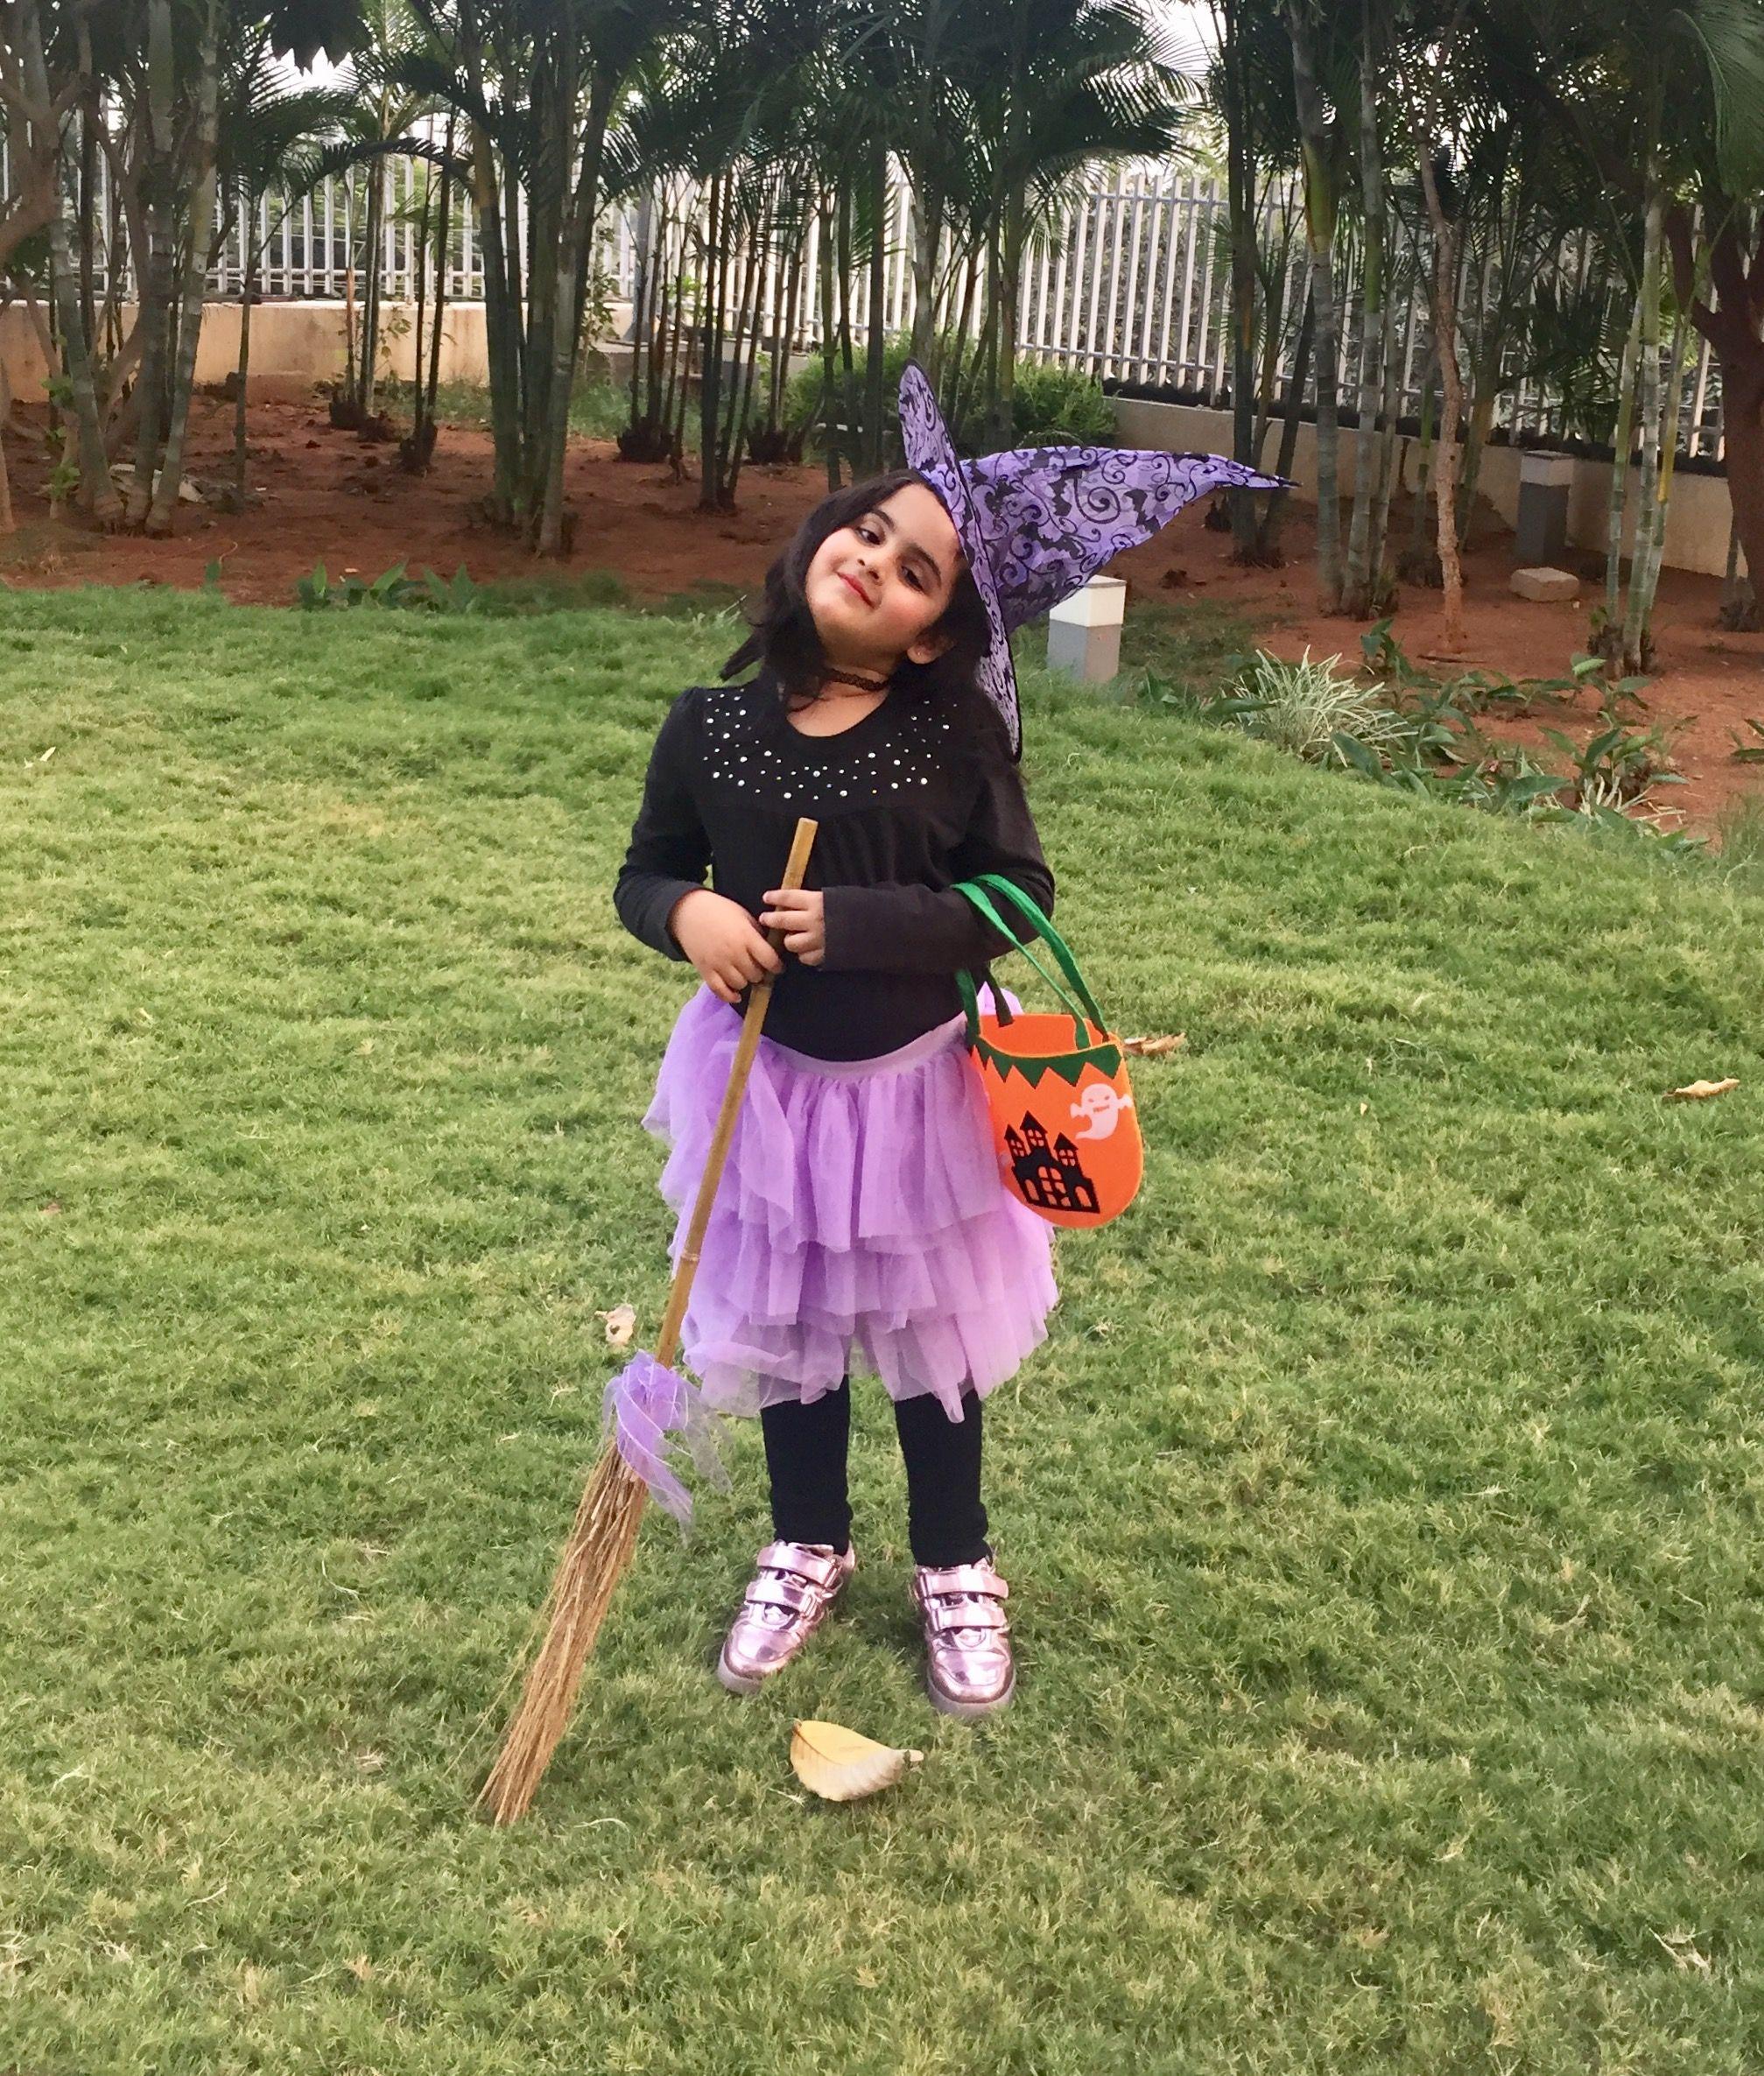 Halloween Tutu witch costume for kids   Kids fashion   Pinterest